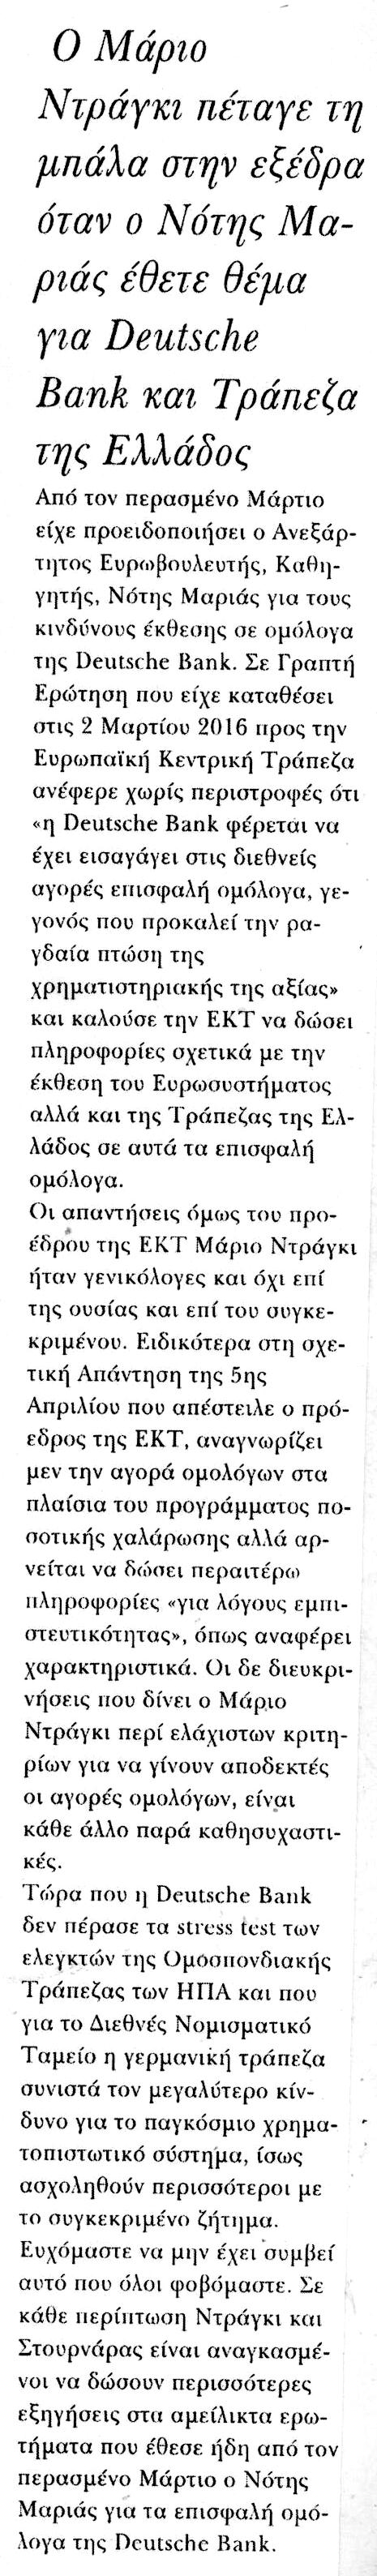 ethnikifoni_04_07_2016_1